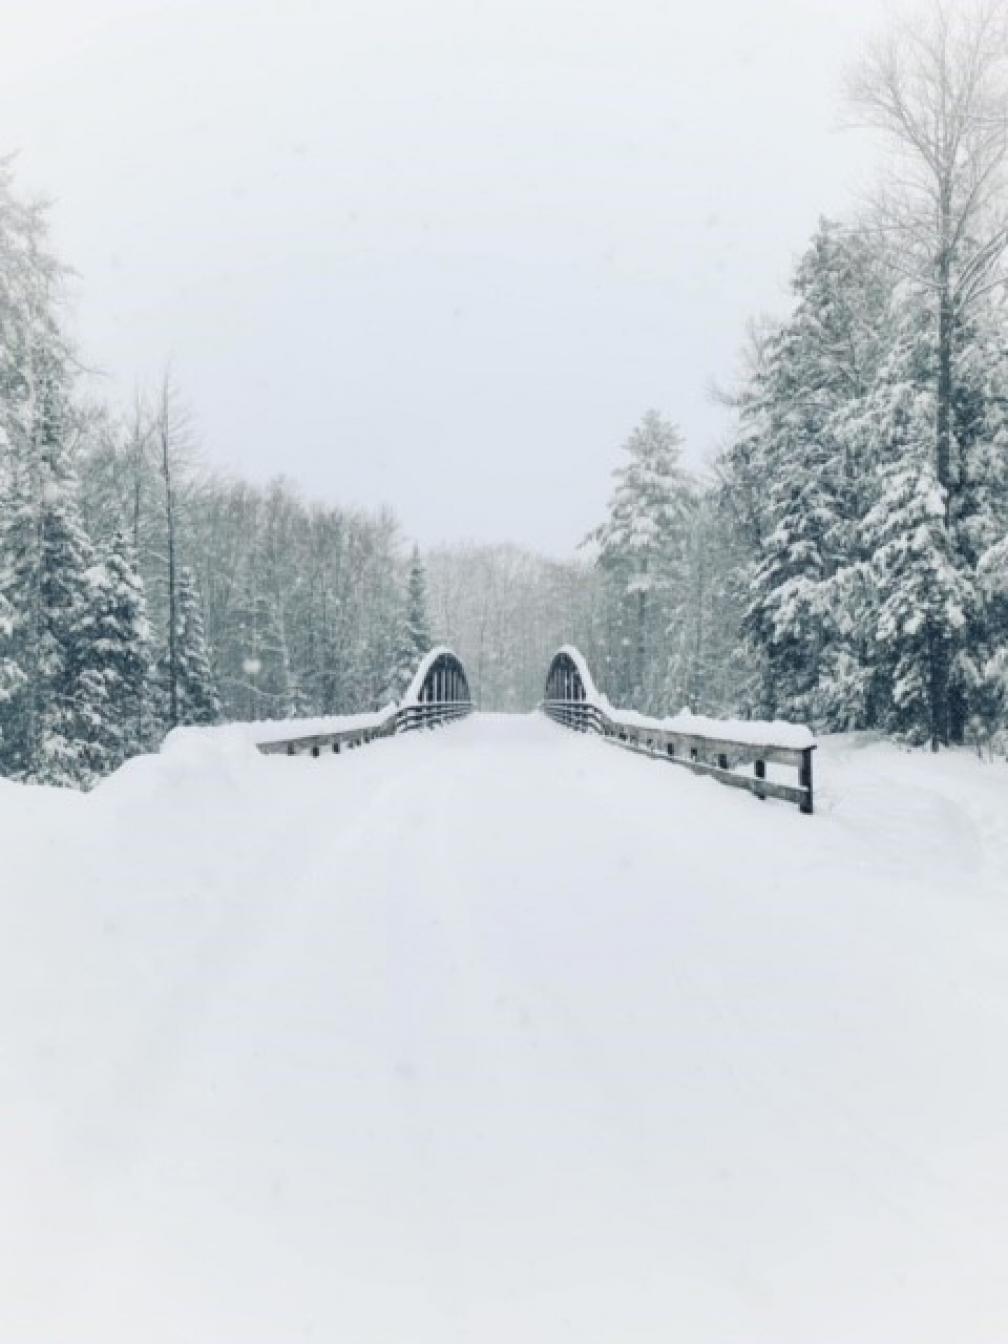 Multi-Modal Bridge in the Winter by Meag Porier